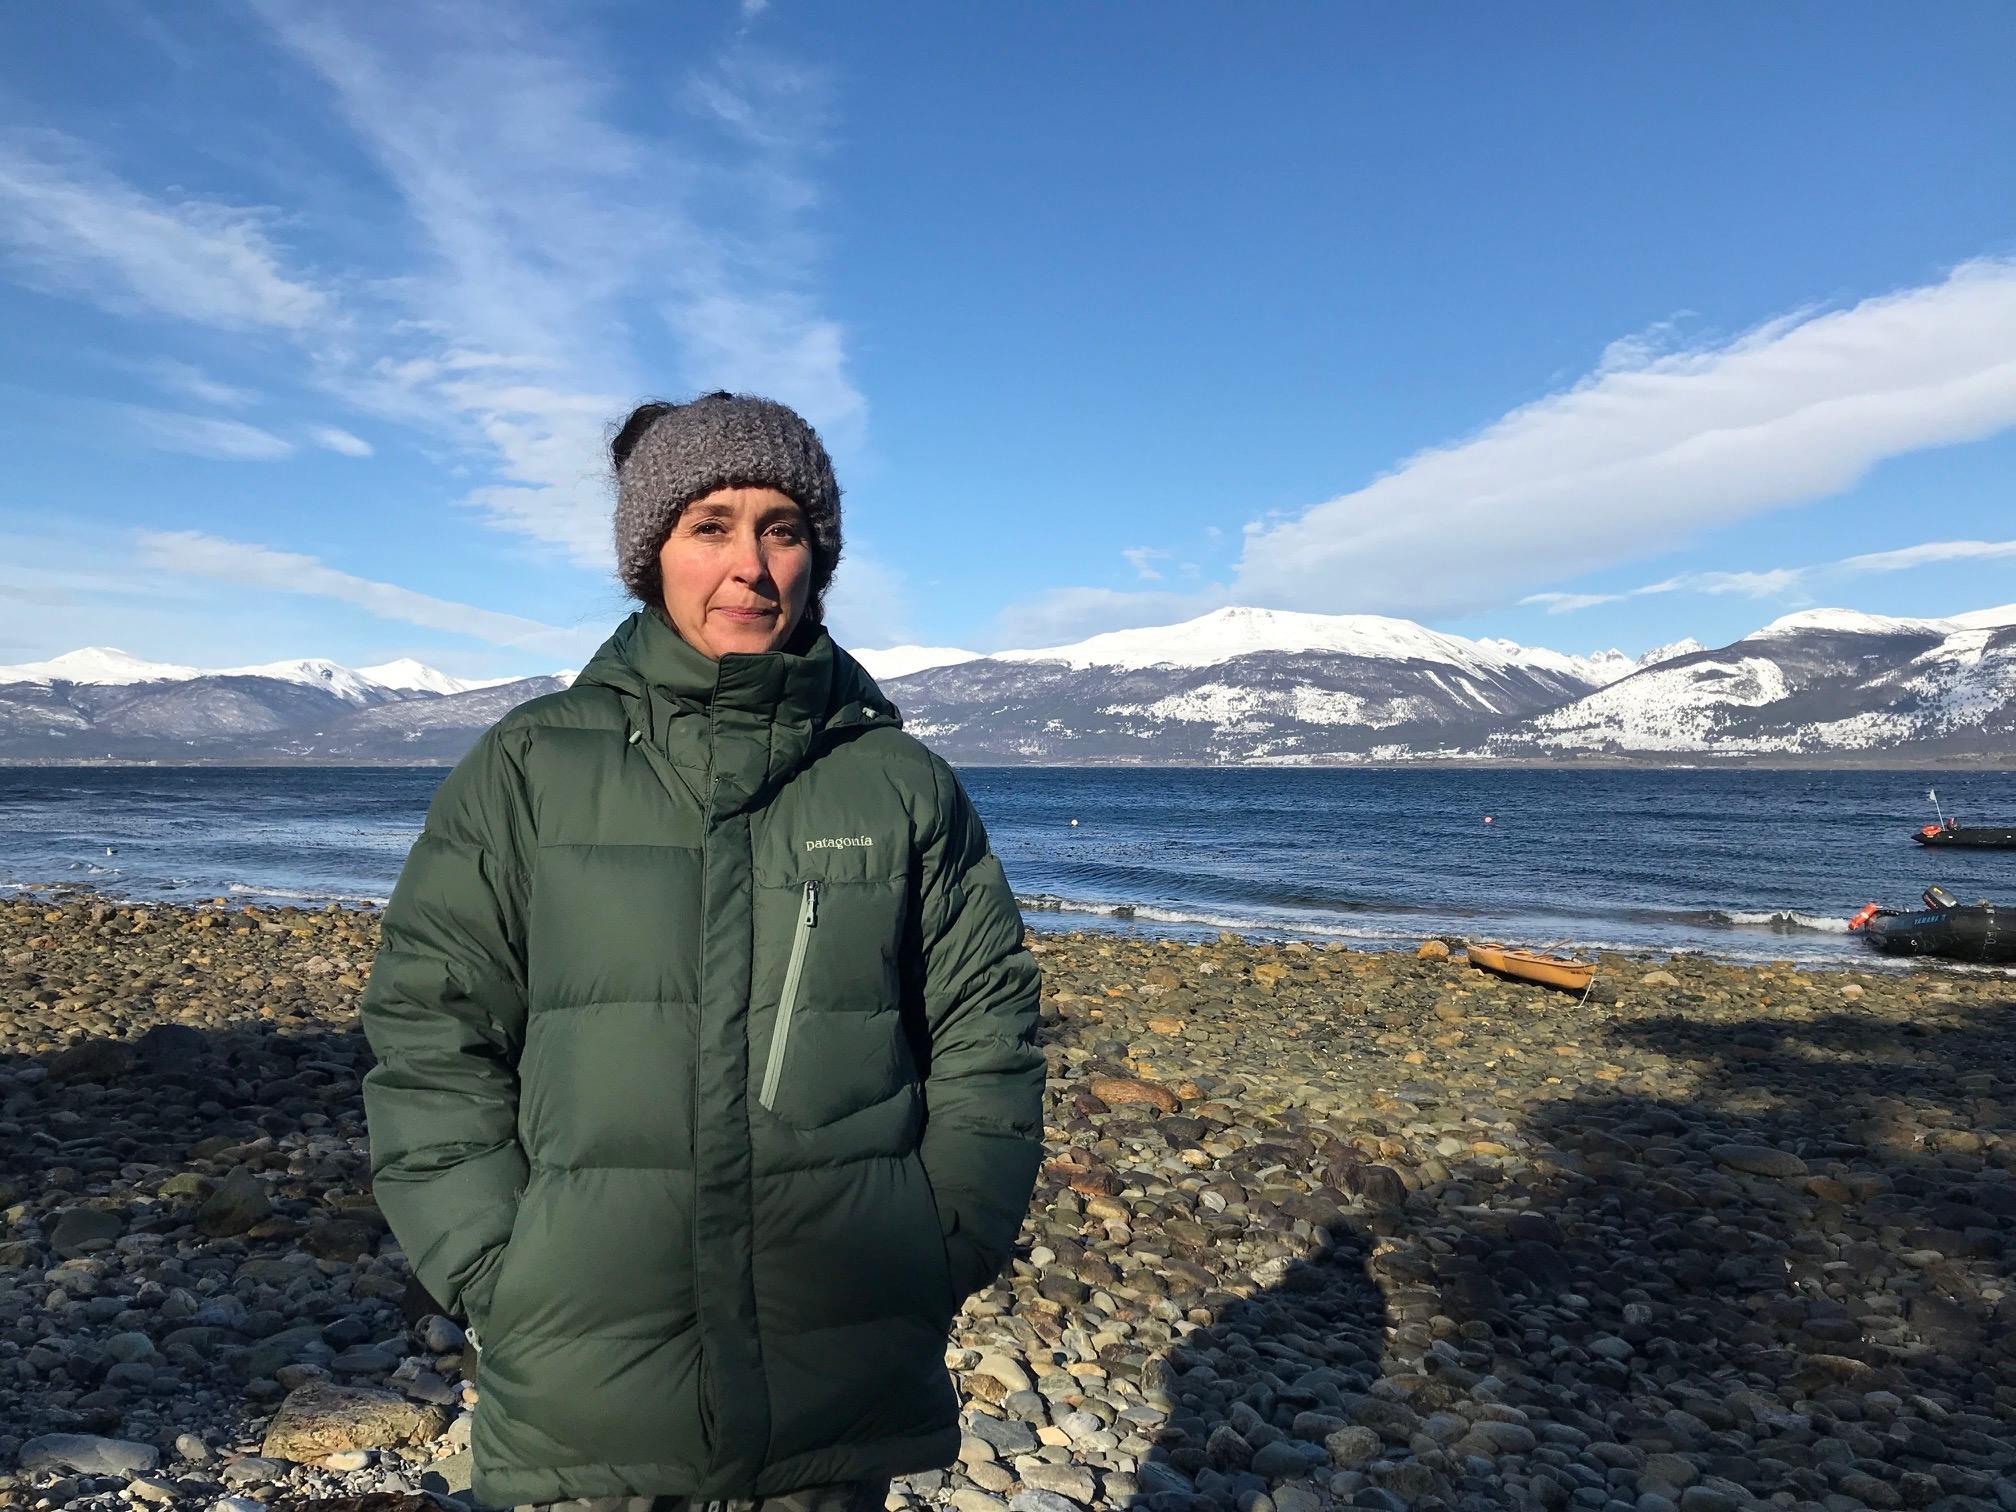 Ushuaia: pesca artesanal de centolla vs. salmonicultura intensiva